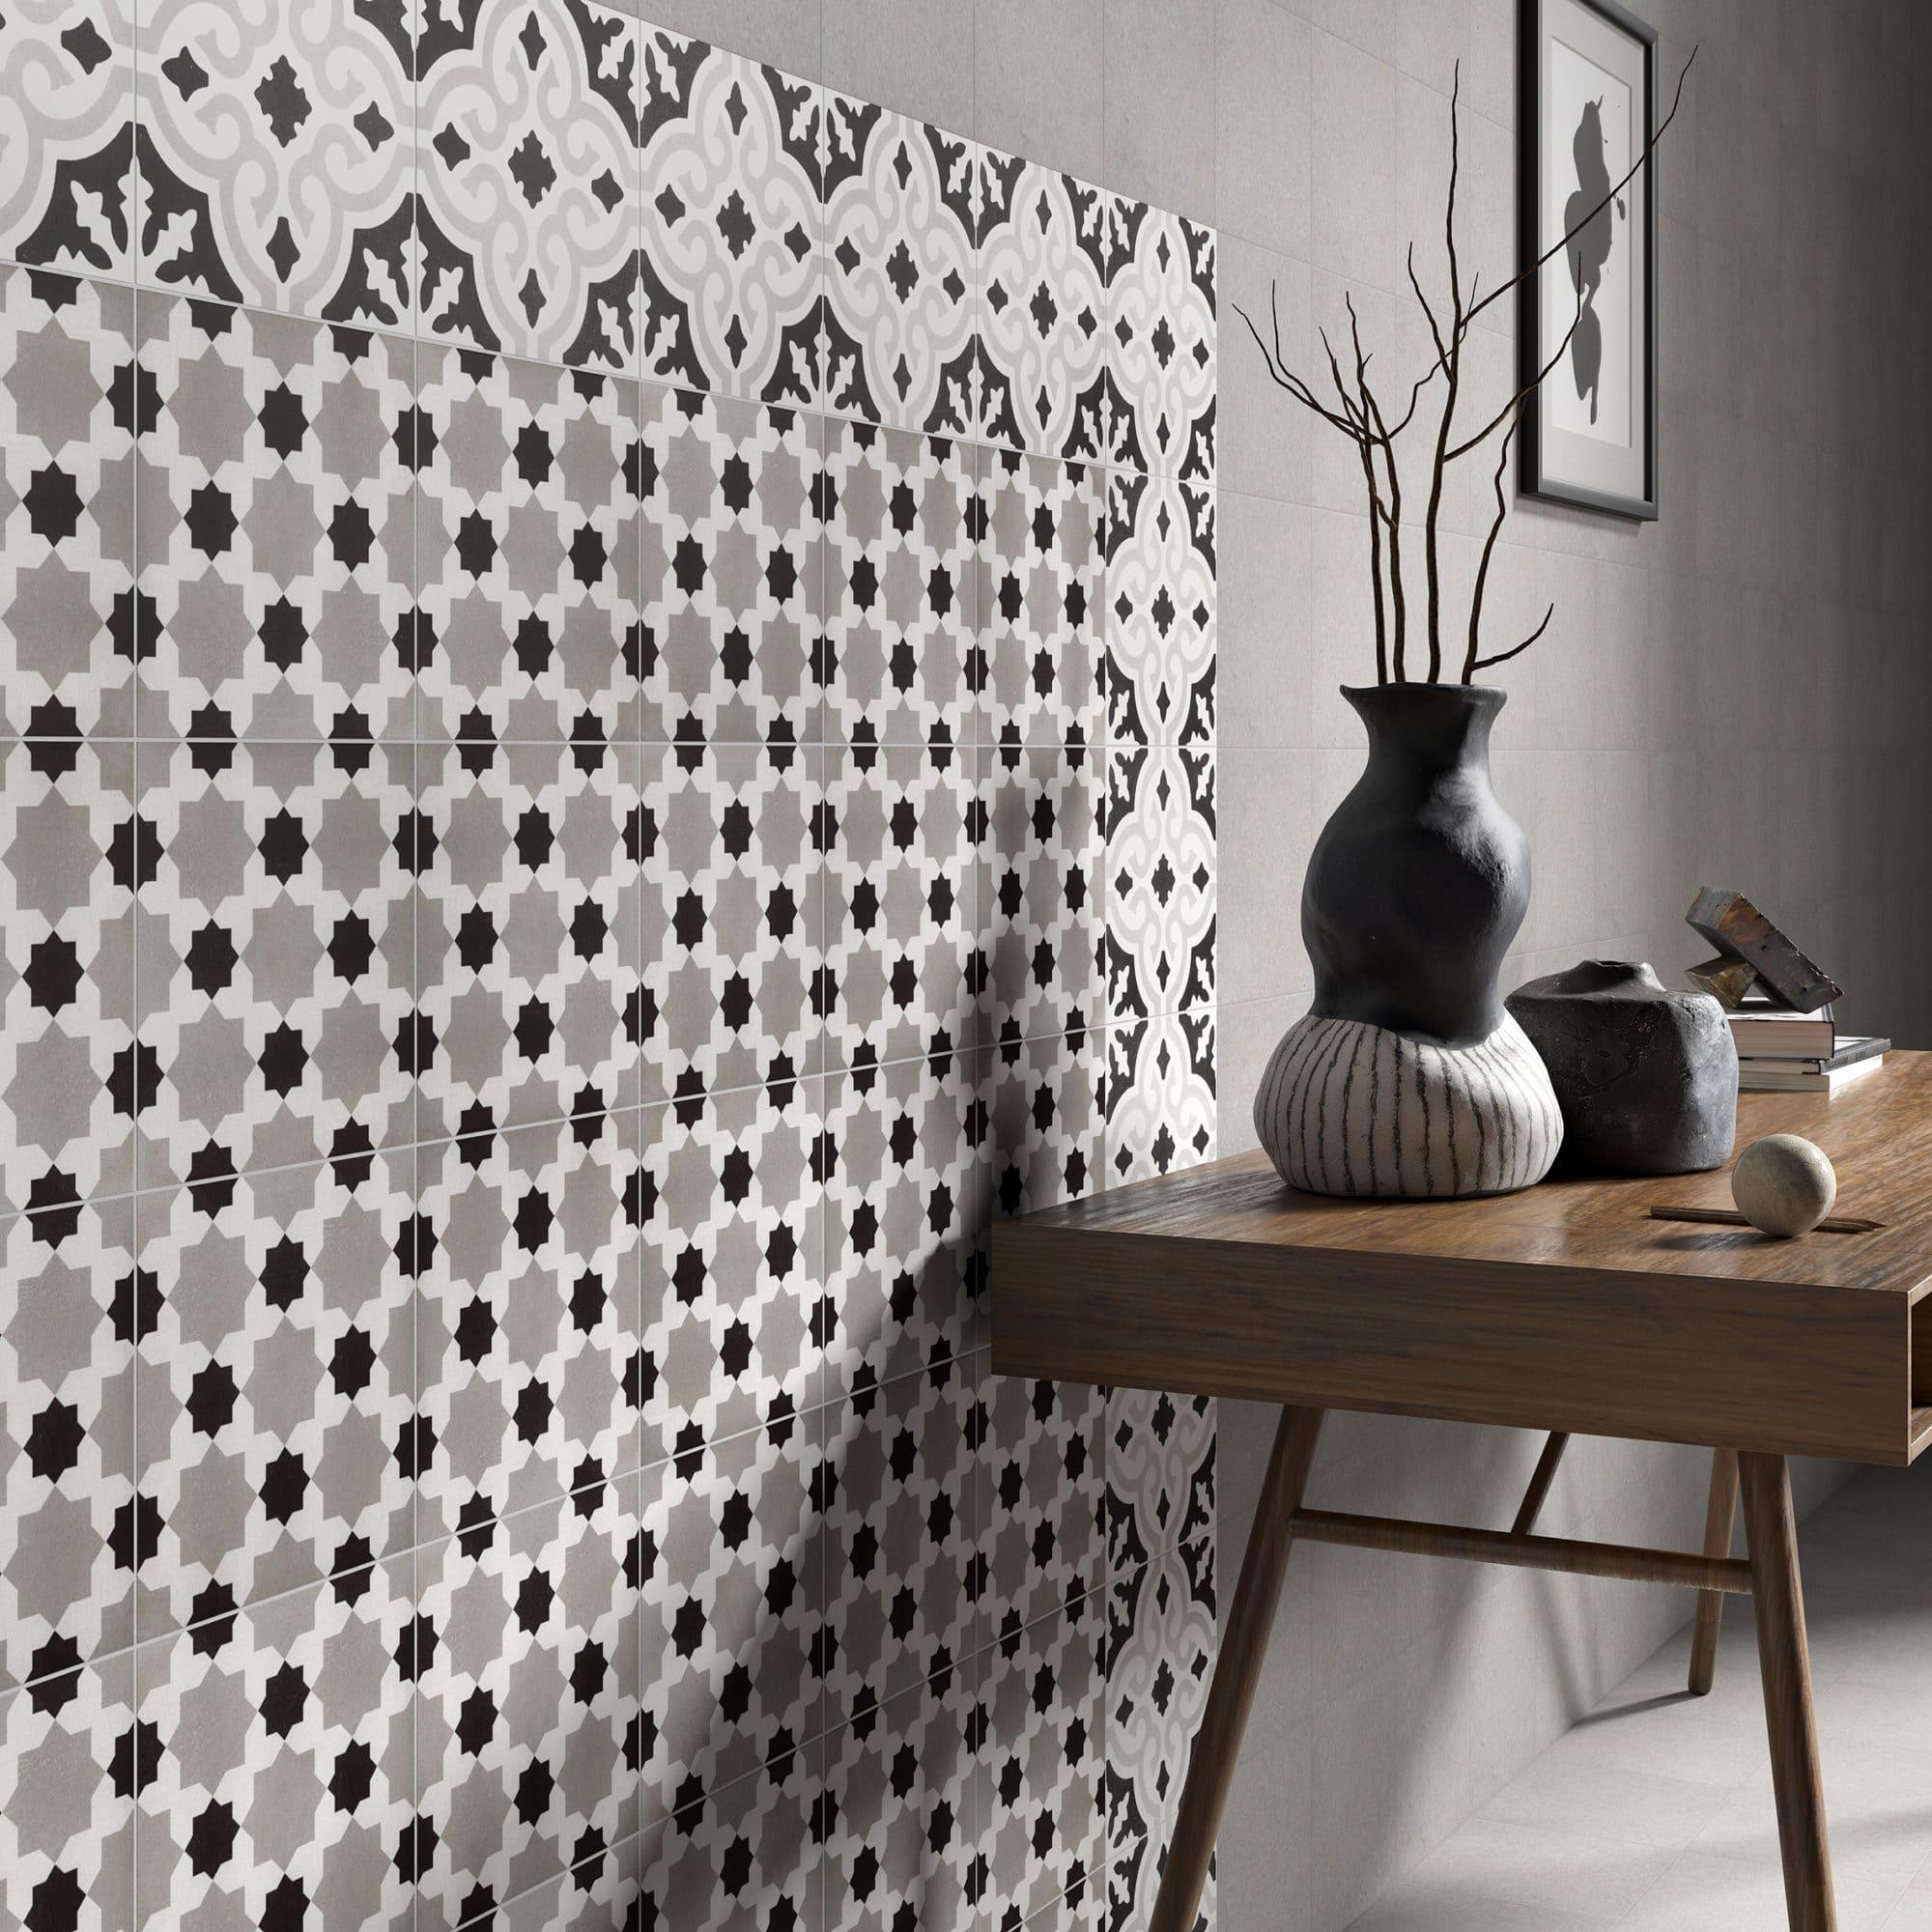 maison du carrelage balma 31 ventana blog. Black Bedroom Furniture Sets. Home Design Ideas